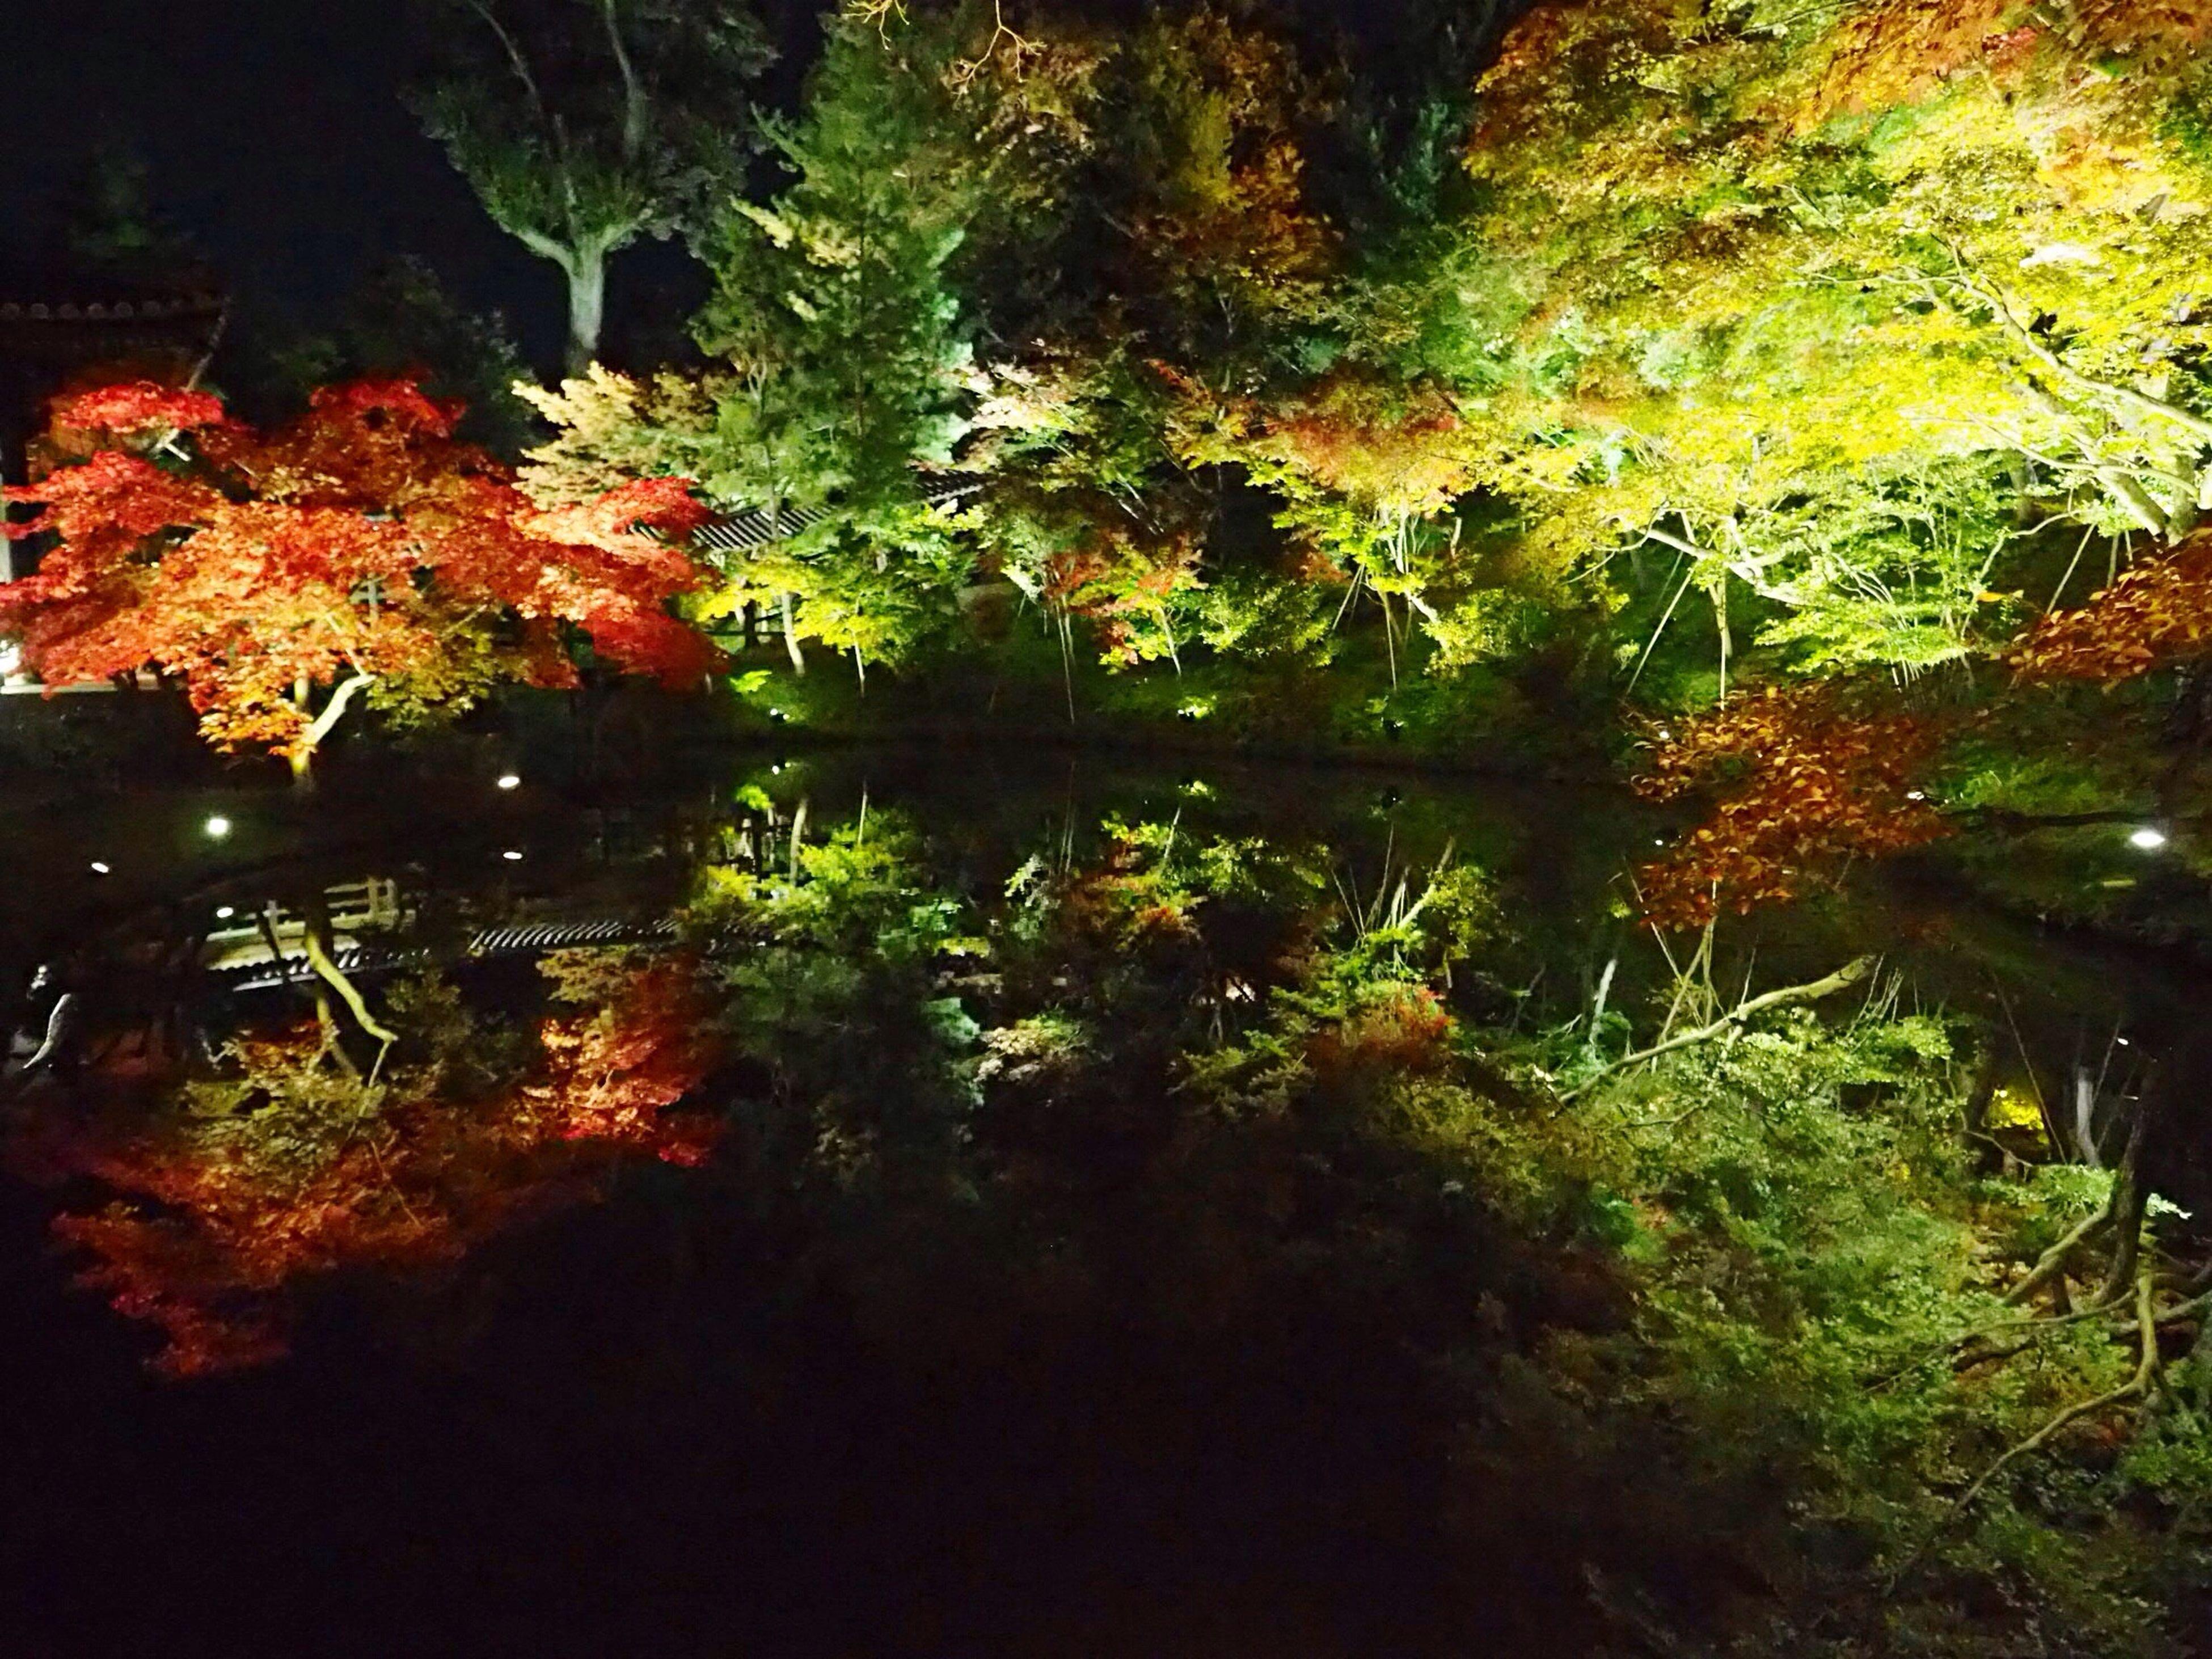 Kyoto Japan Kodaiji Ko-daiji Temple Koudaiji Higashiyama Lightup Night Garyouchi Pond Reflection Beautiful Autumn Autumn Colors Leaves Olympus PEN-F 京都 日本 高台寺 東山 臥龍池 紅葉 秋